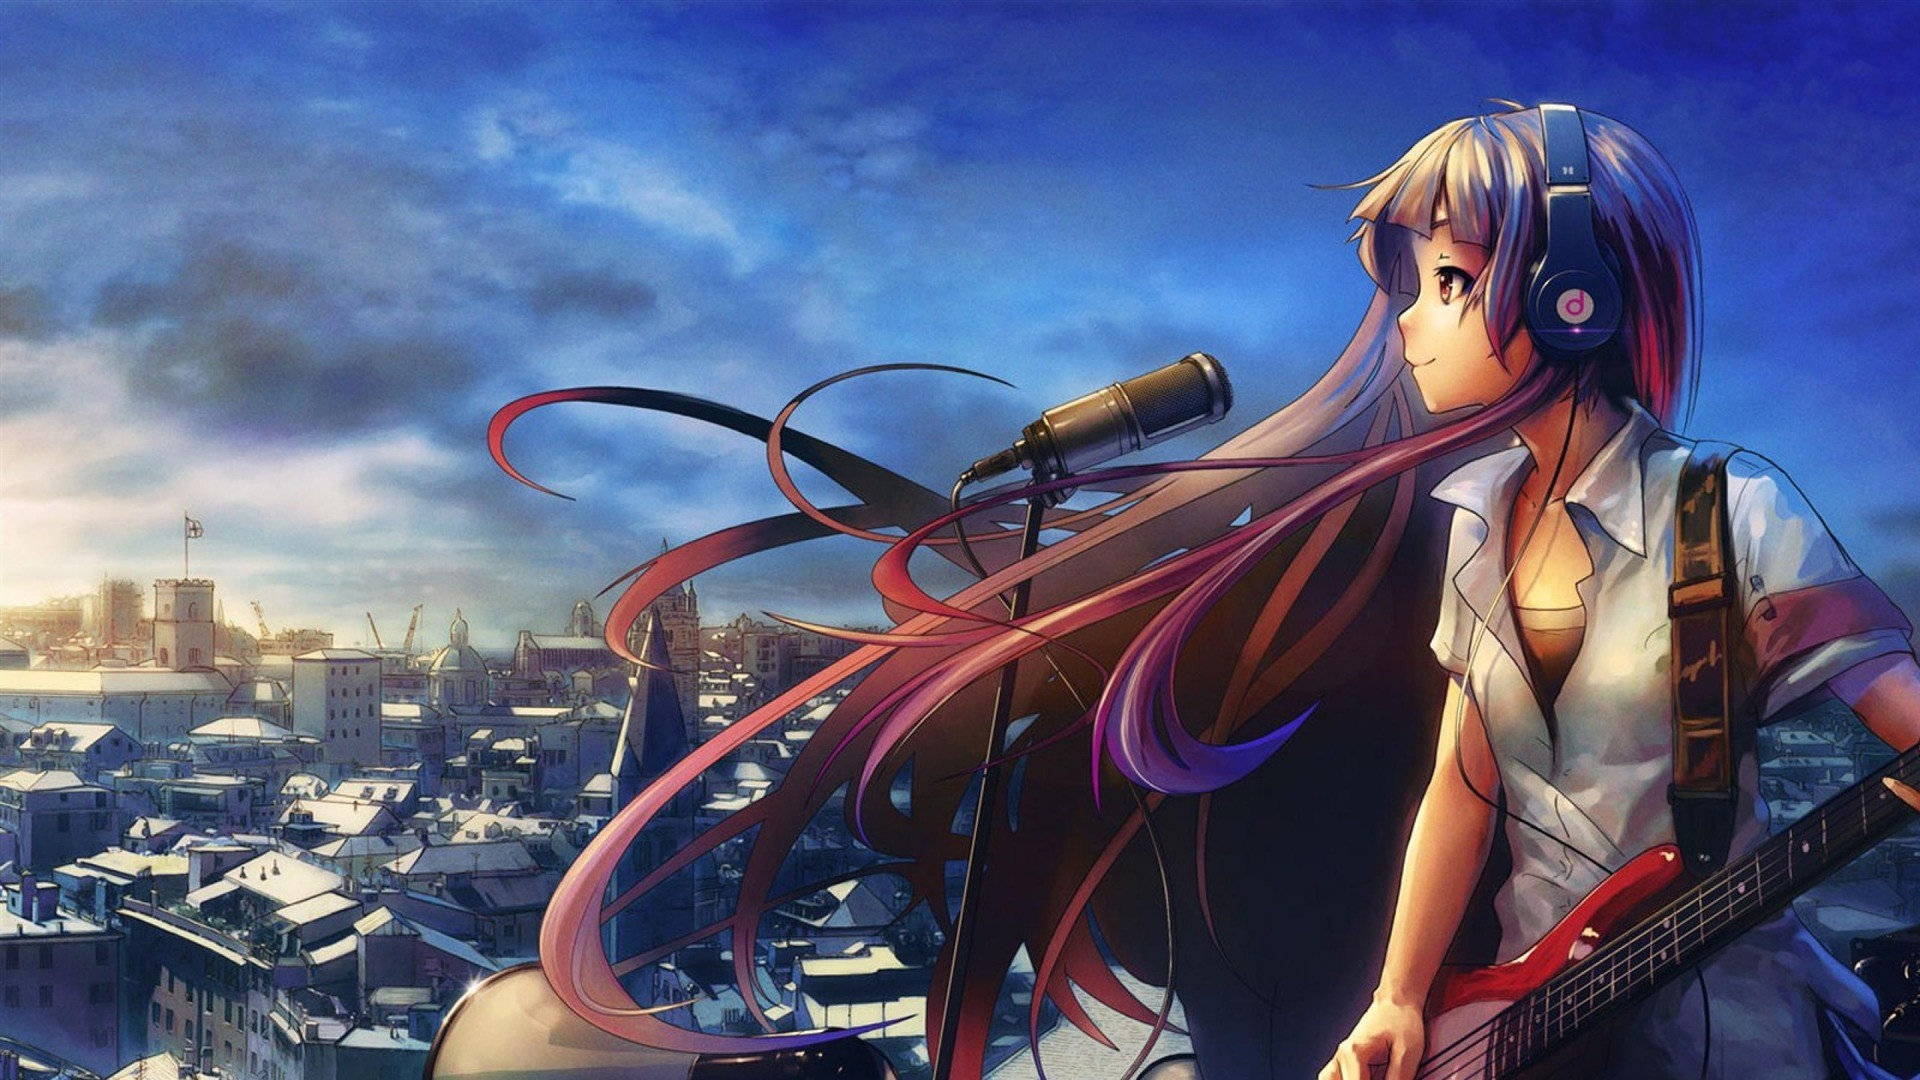 Anime Music Wallpaper 77 Images